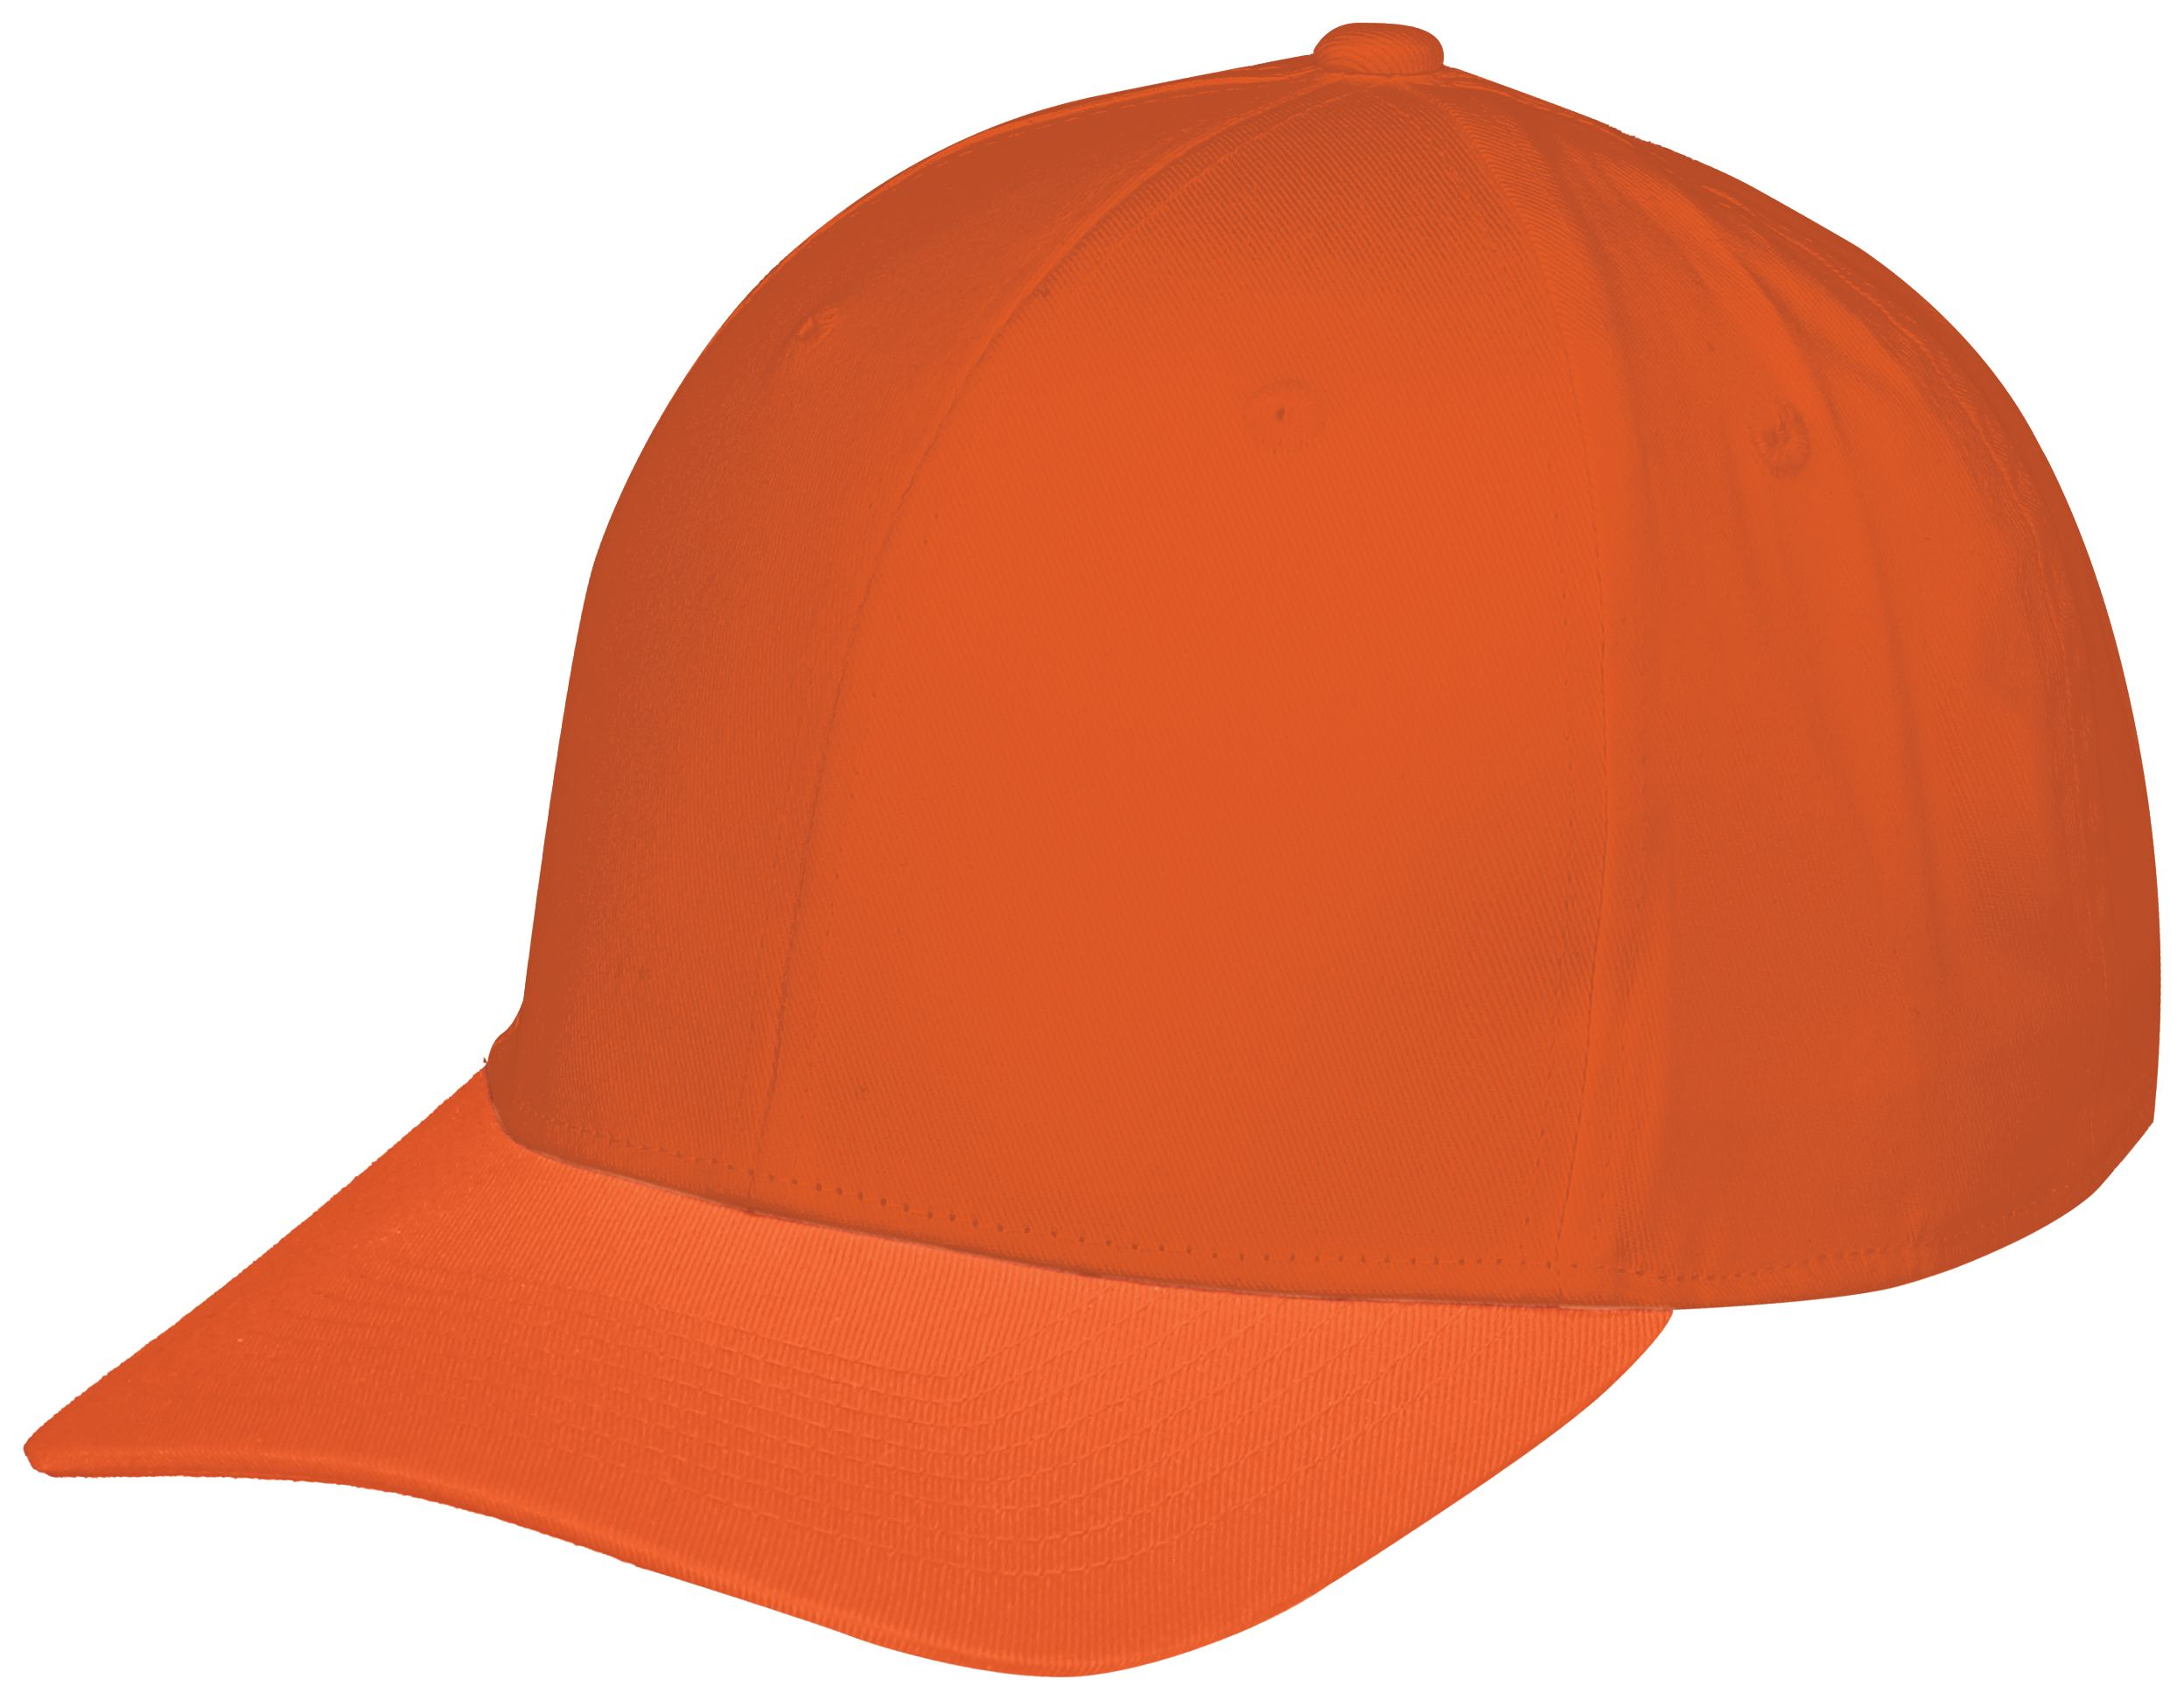 Youth Rally Cotton Twill Cap - Orange